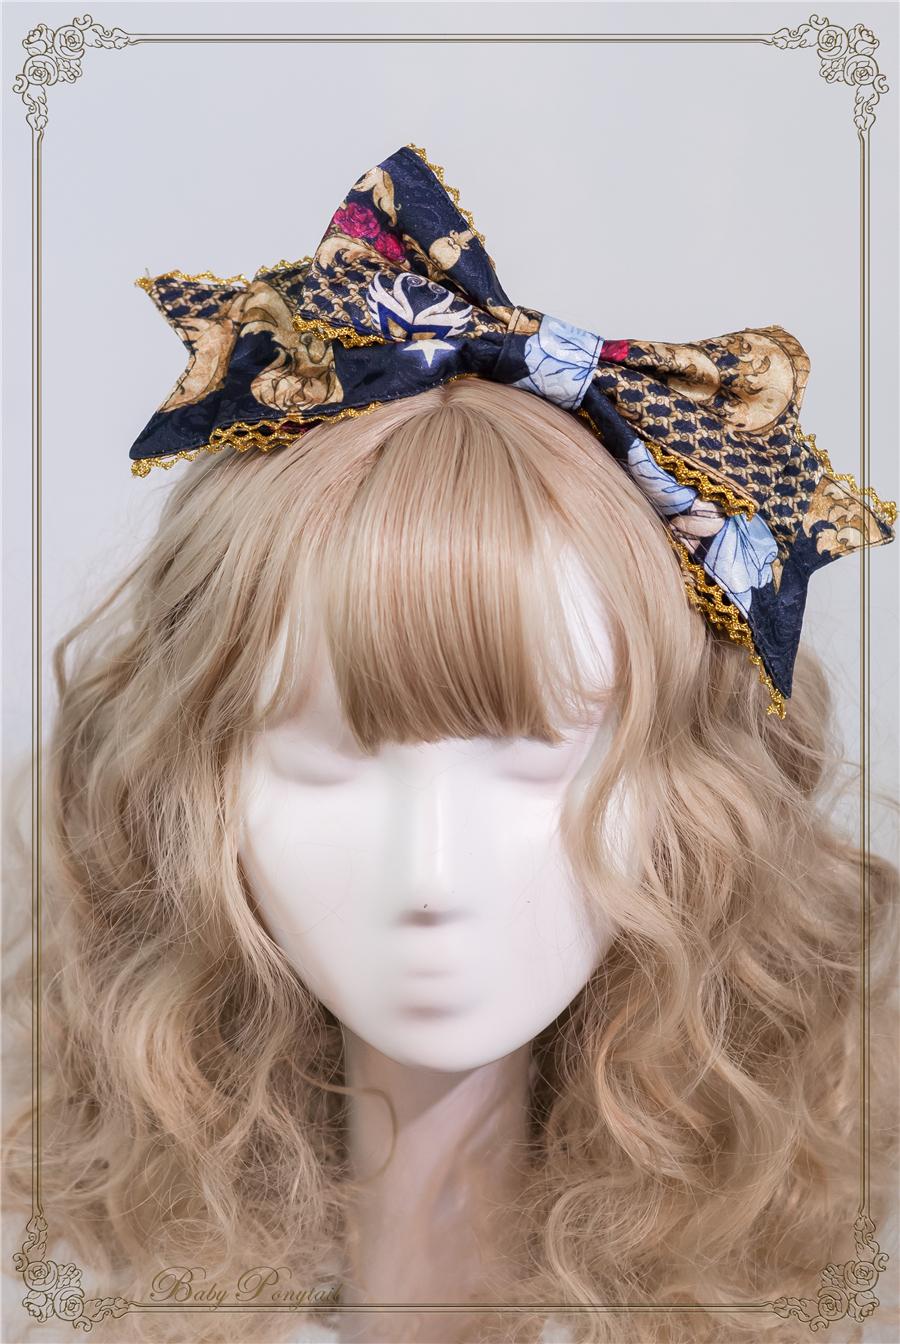 Baby Ponytail_Stock photo_Circus Princess_KC Black_02.jpg